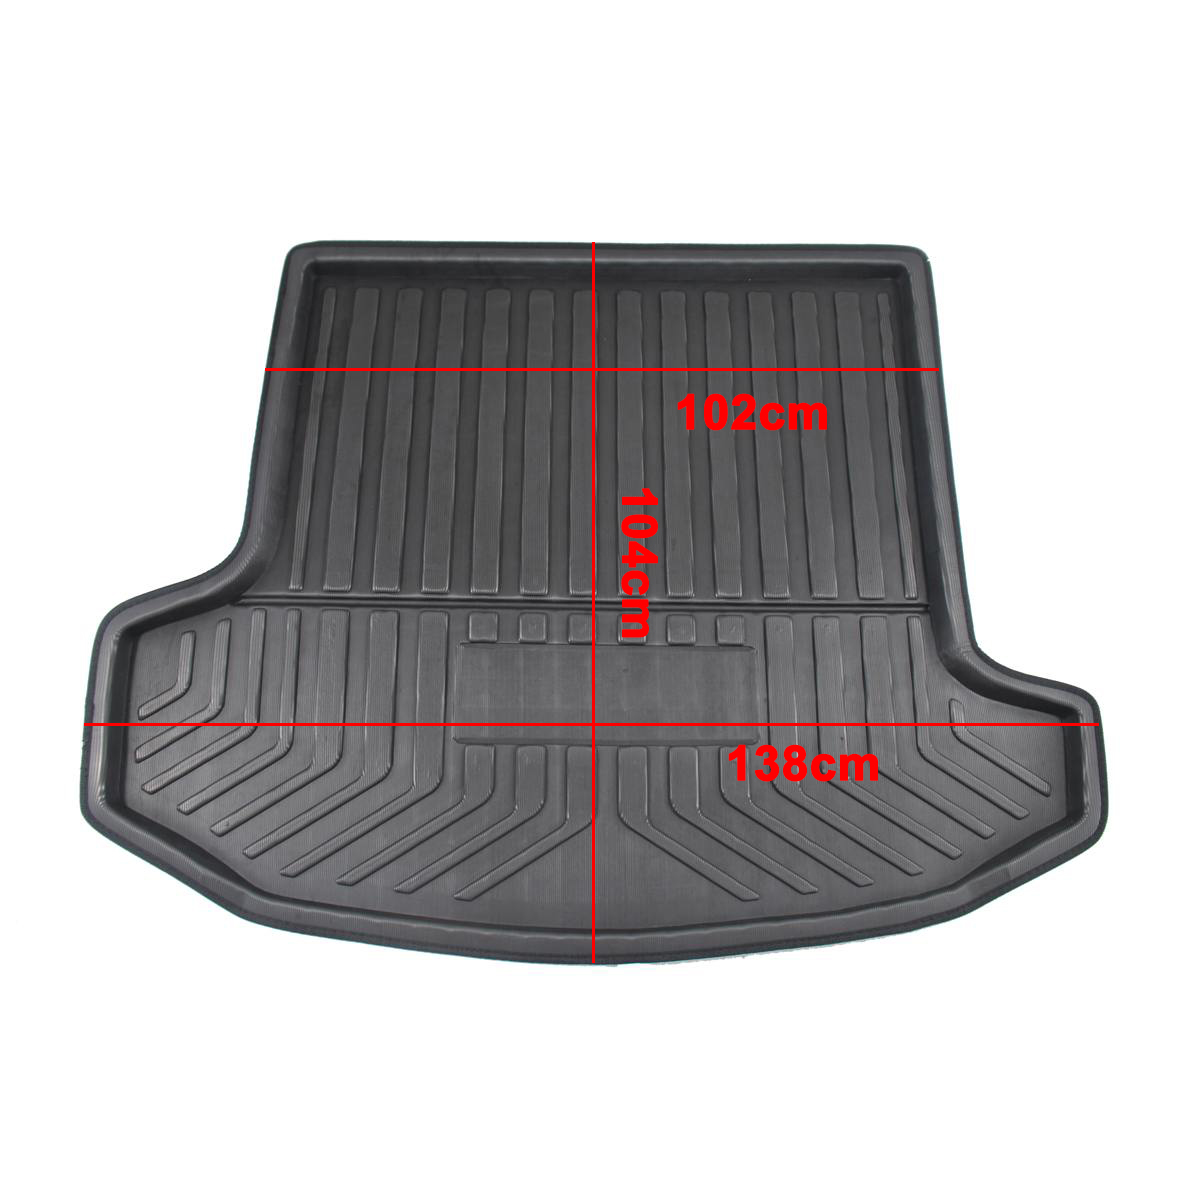 For SKODA Kodiaq 5/7 Seat Seater 2017 2018 2019 Matt Mat Floor Carpet Kick Pad Car Cargo Liner Boot Tray Rear Trunk Cover